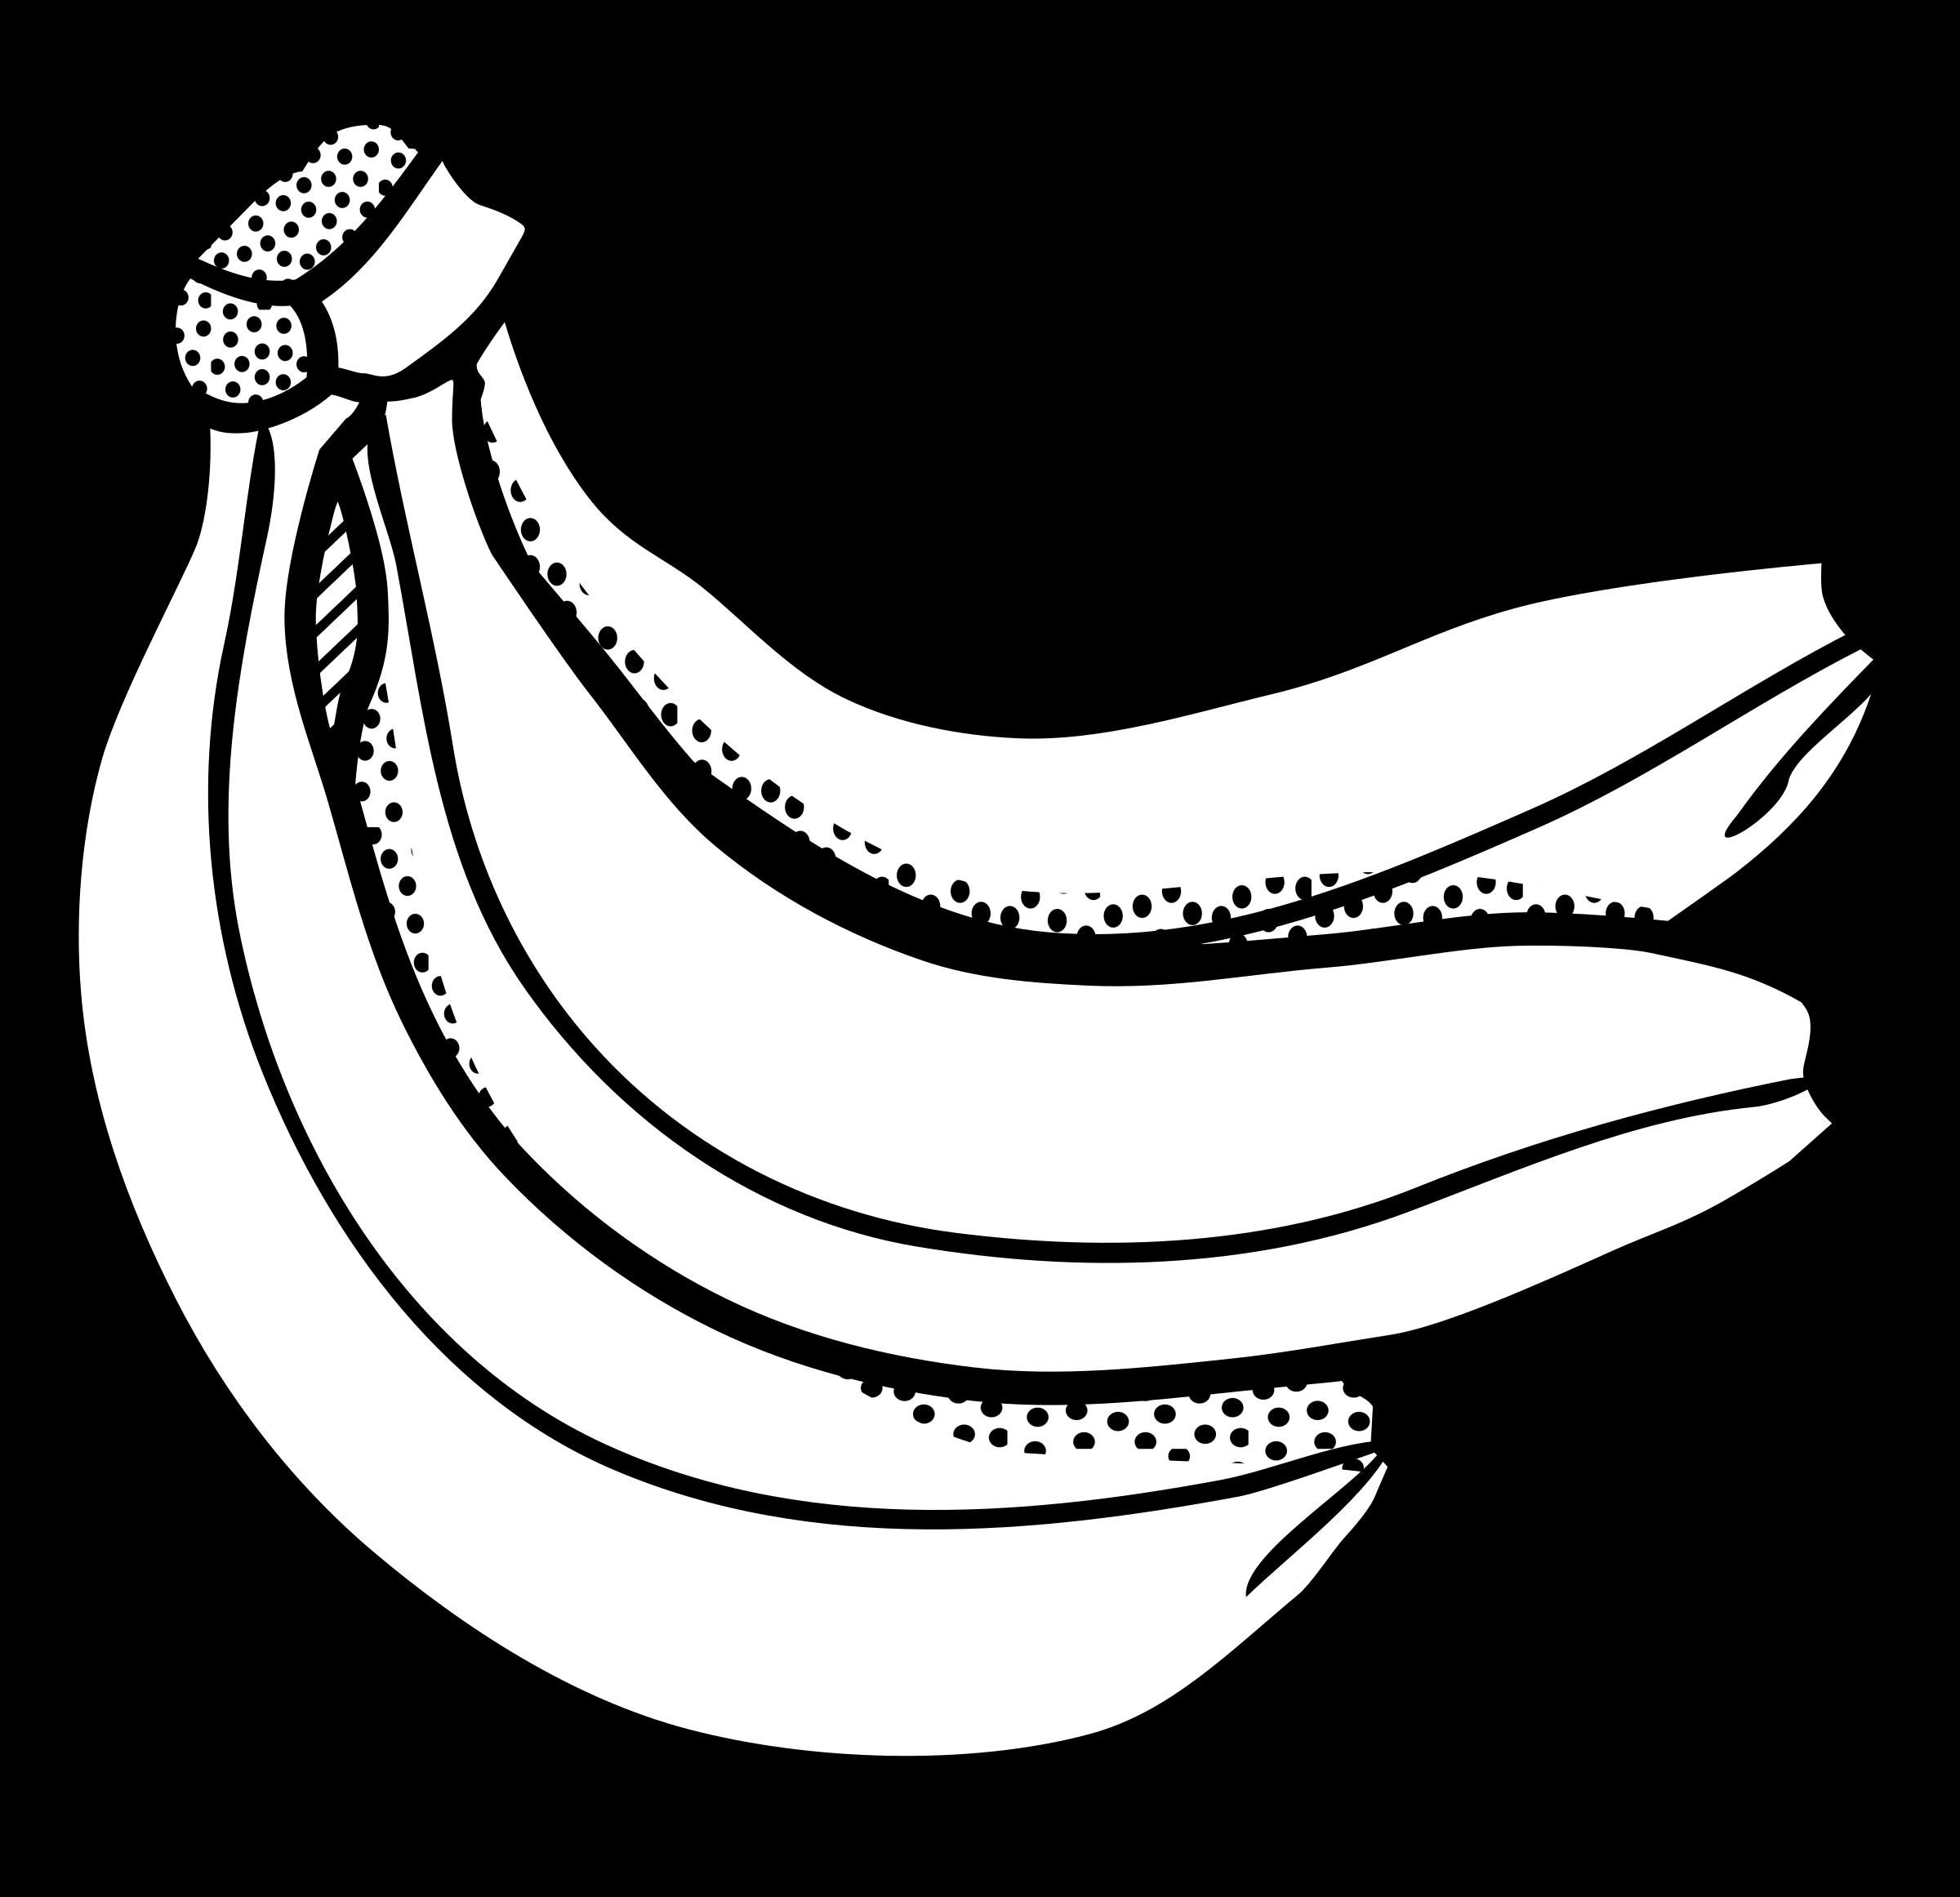 Black and white pumpkin pie clipart clip library stock banana black and white clipart banana clipart black and white ... clip library stock